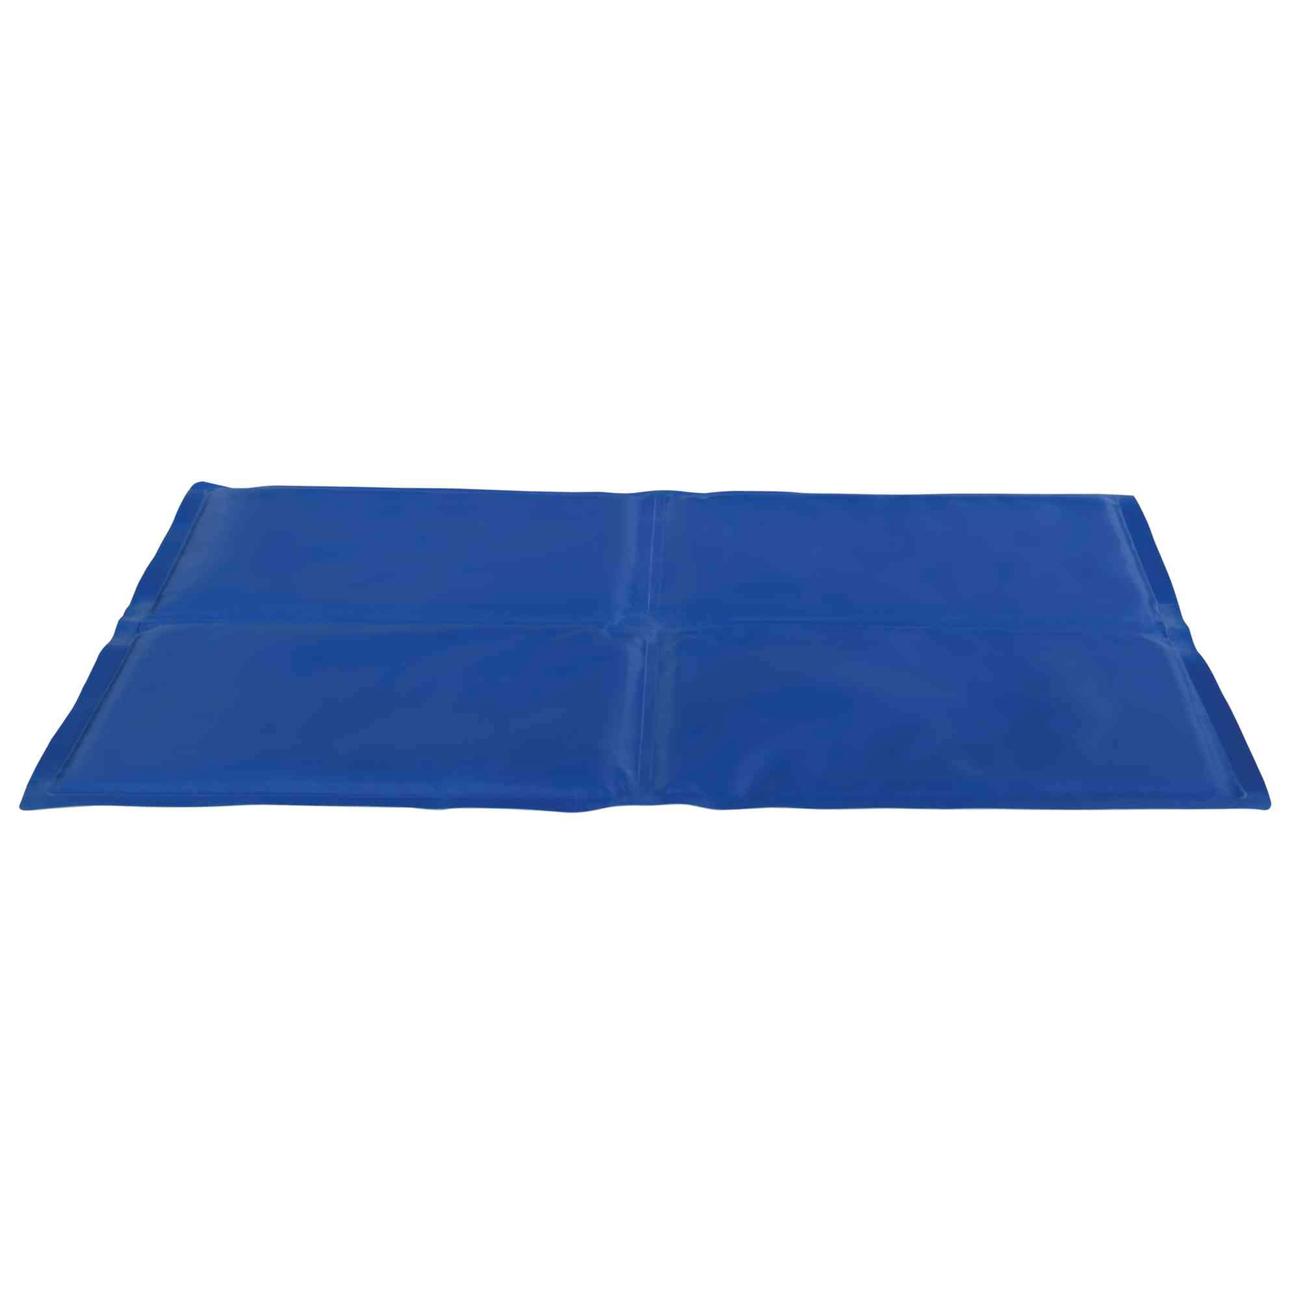 TRIXIE Kühlmatte für Hunde, 90 × 50 cm, blau